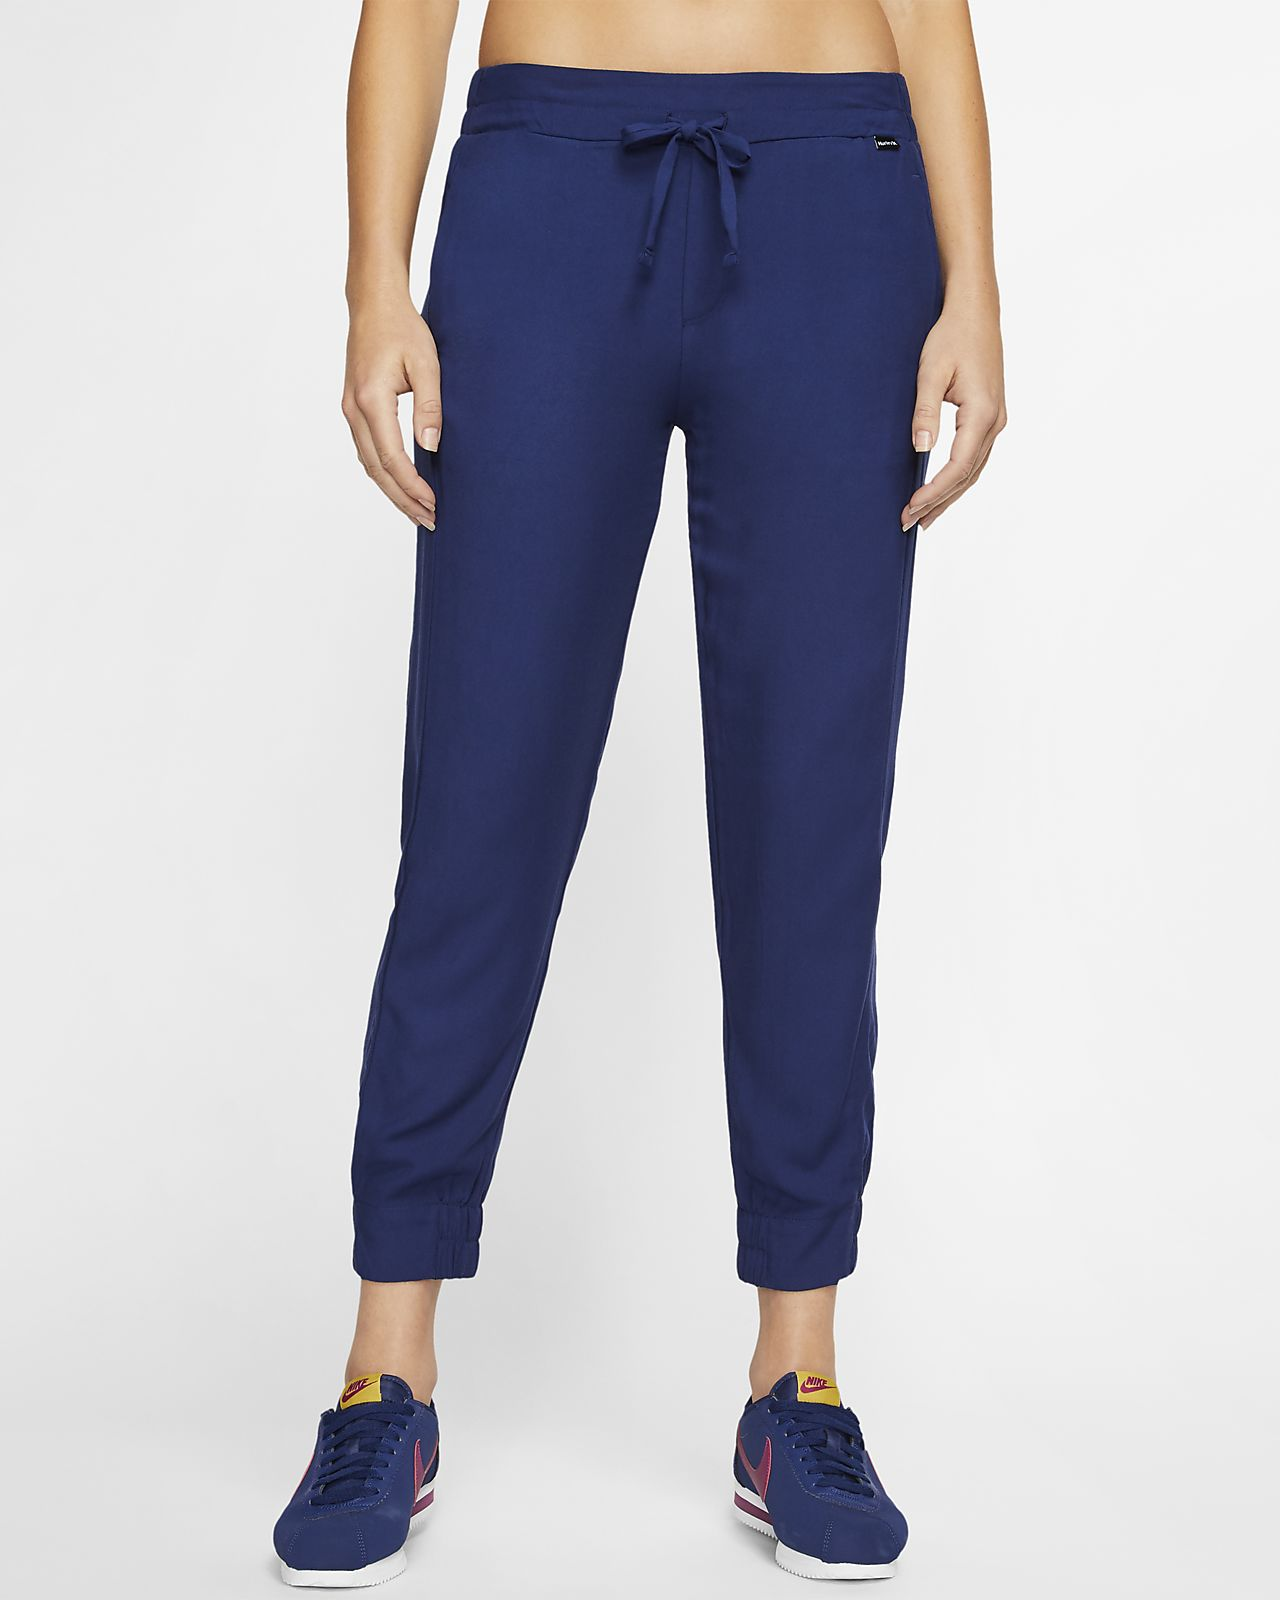 Hurley Beach Women's Trousers